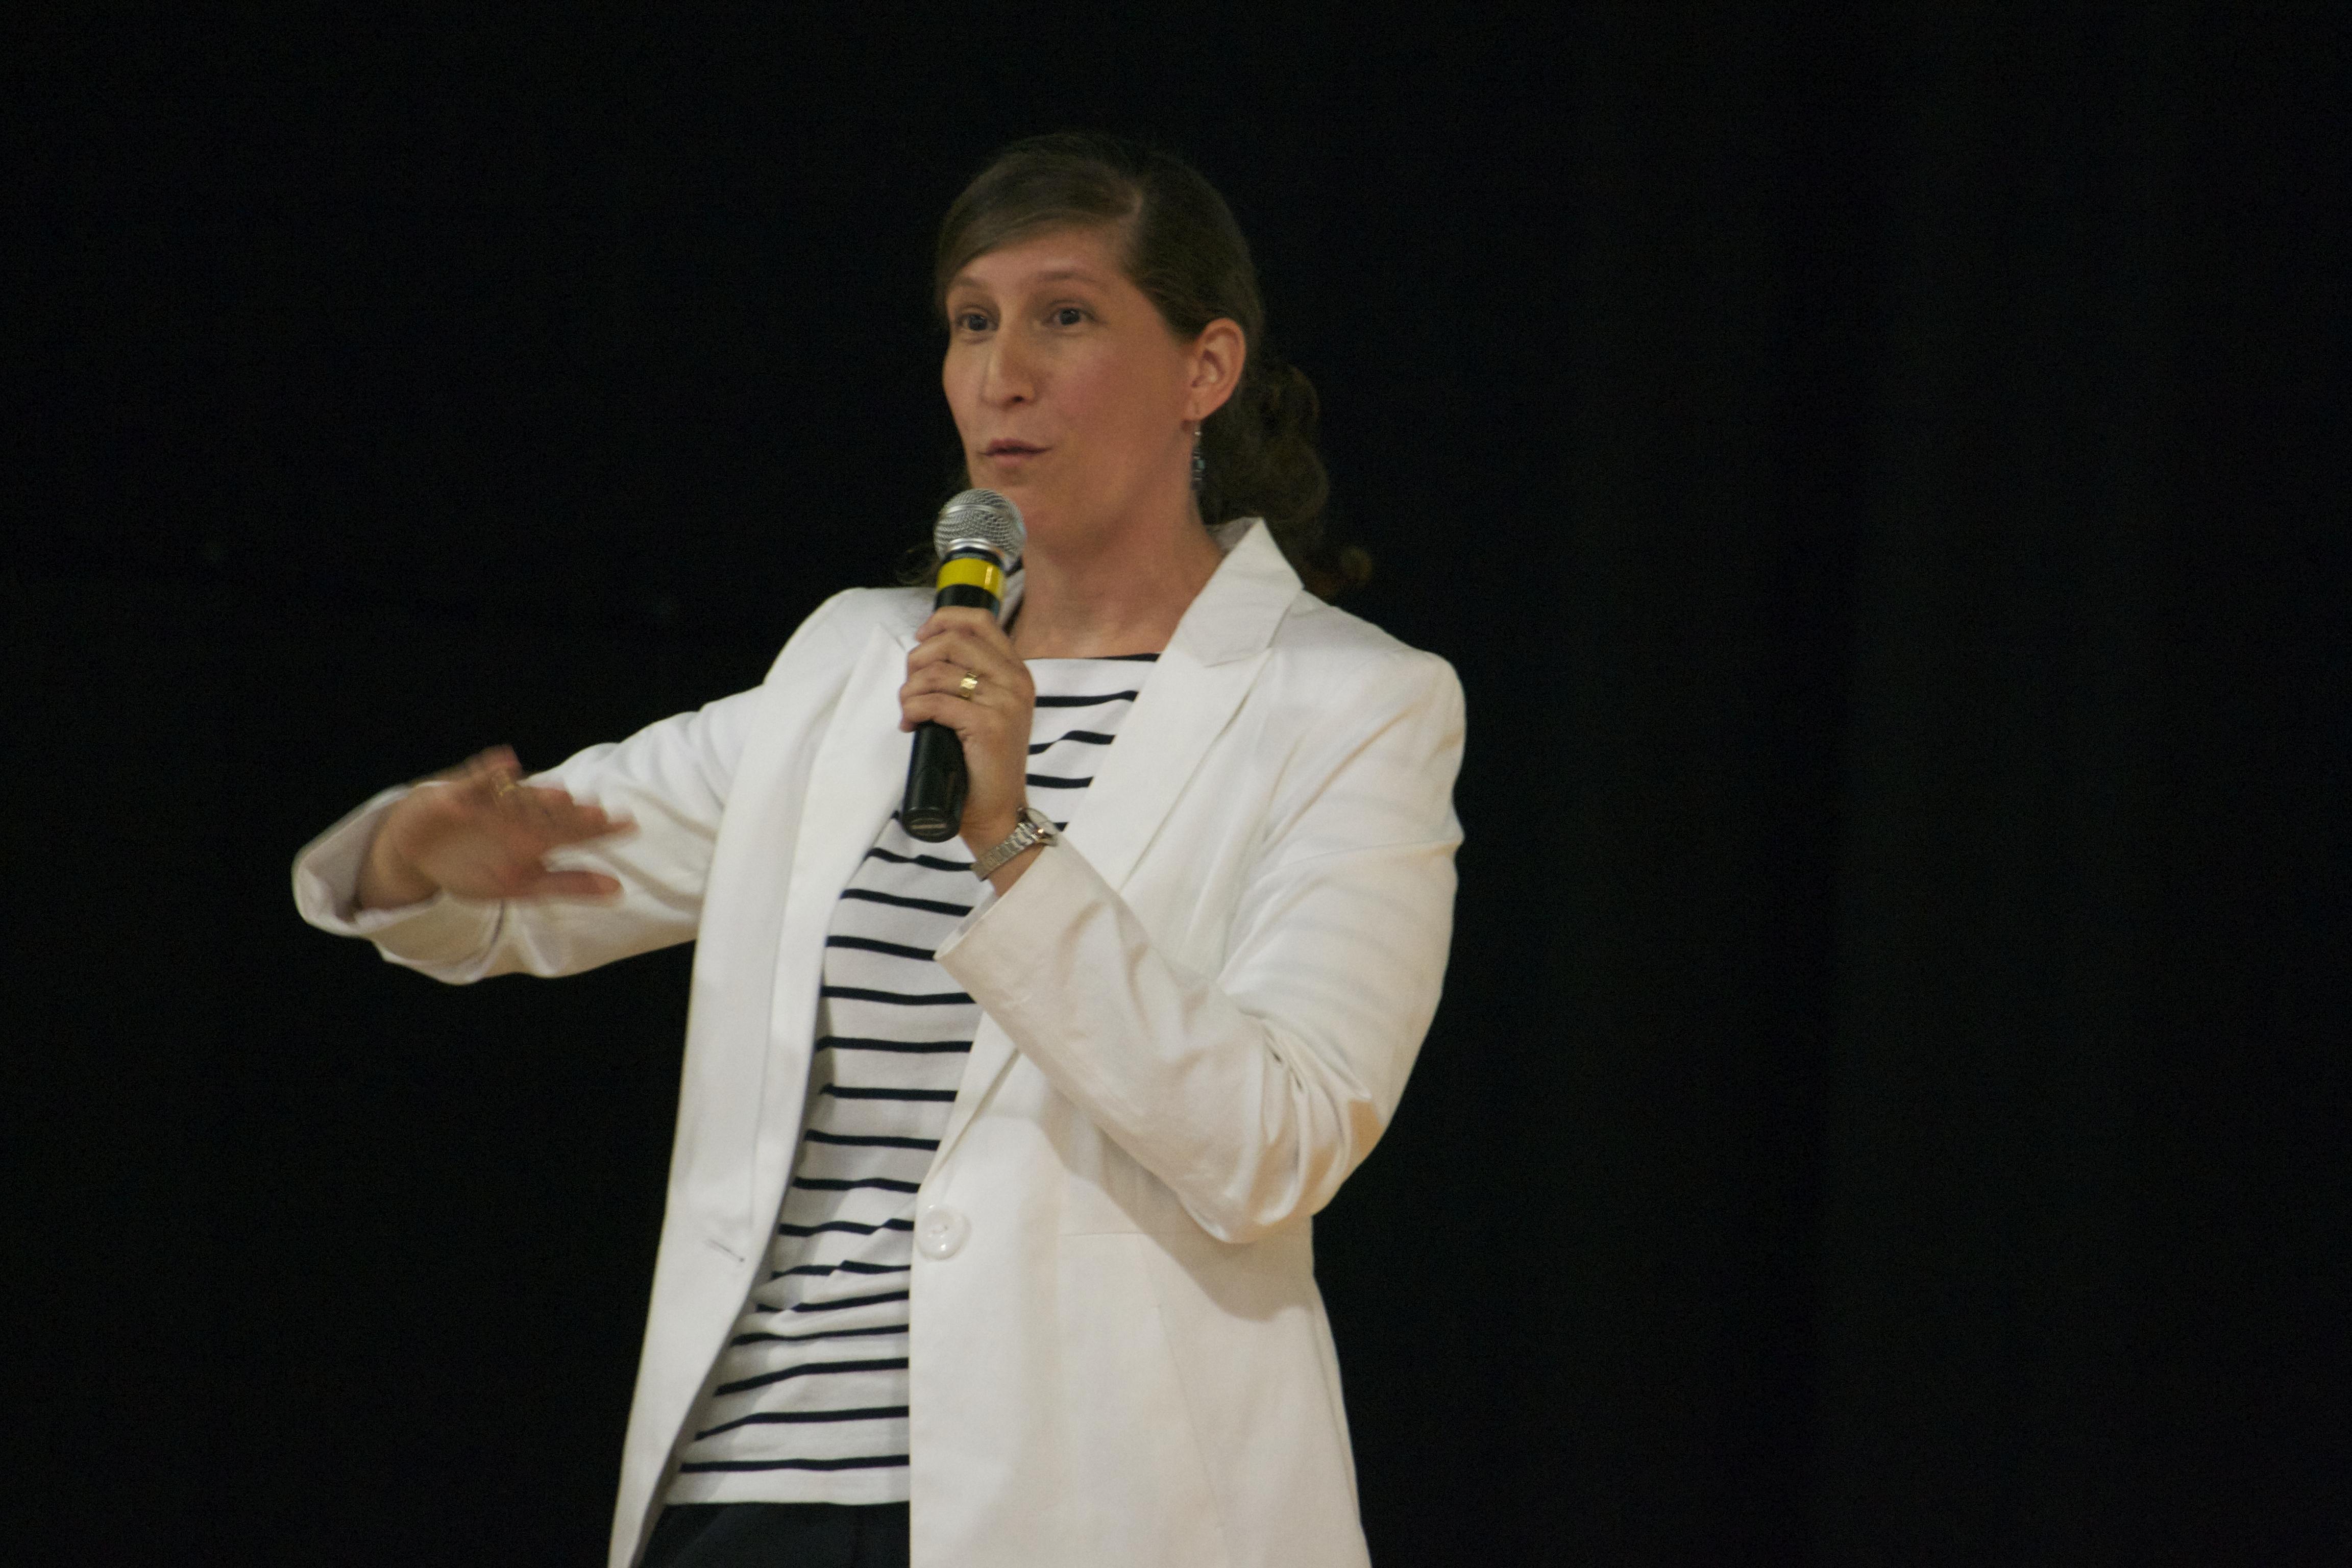 Susana Christansen